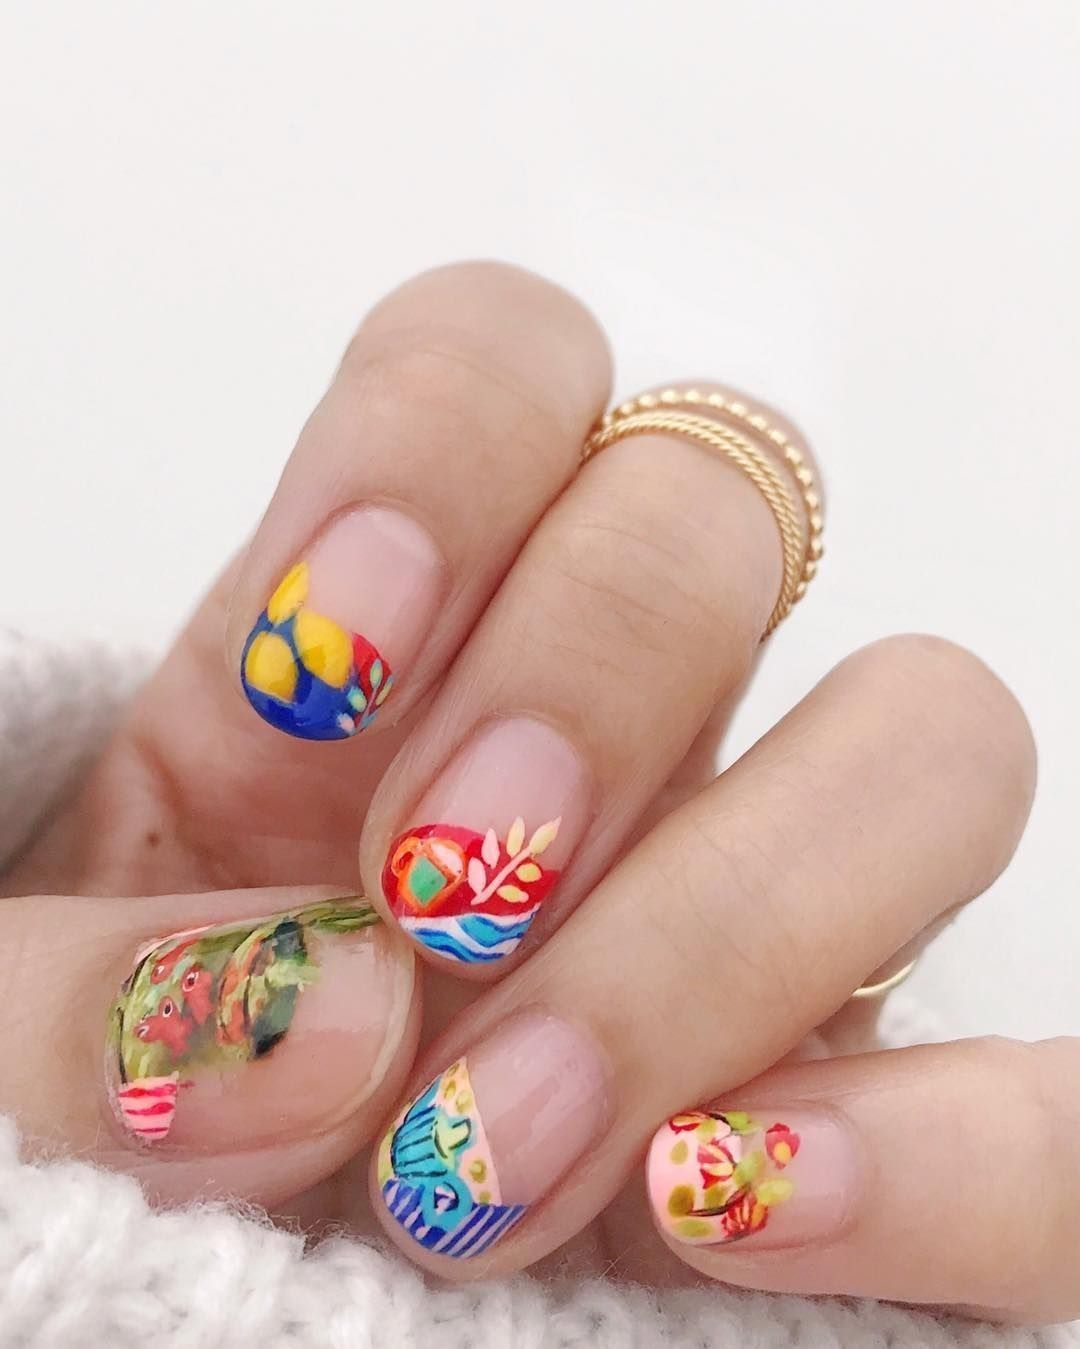 Henna na paznokciach [Mandala Nails]   Henna nails, Nails